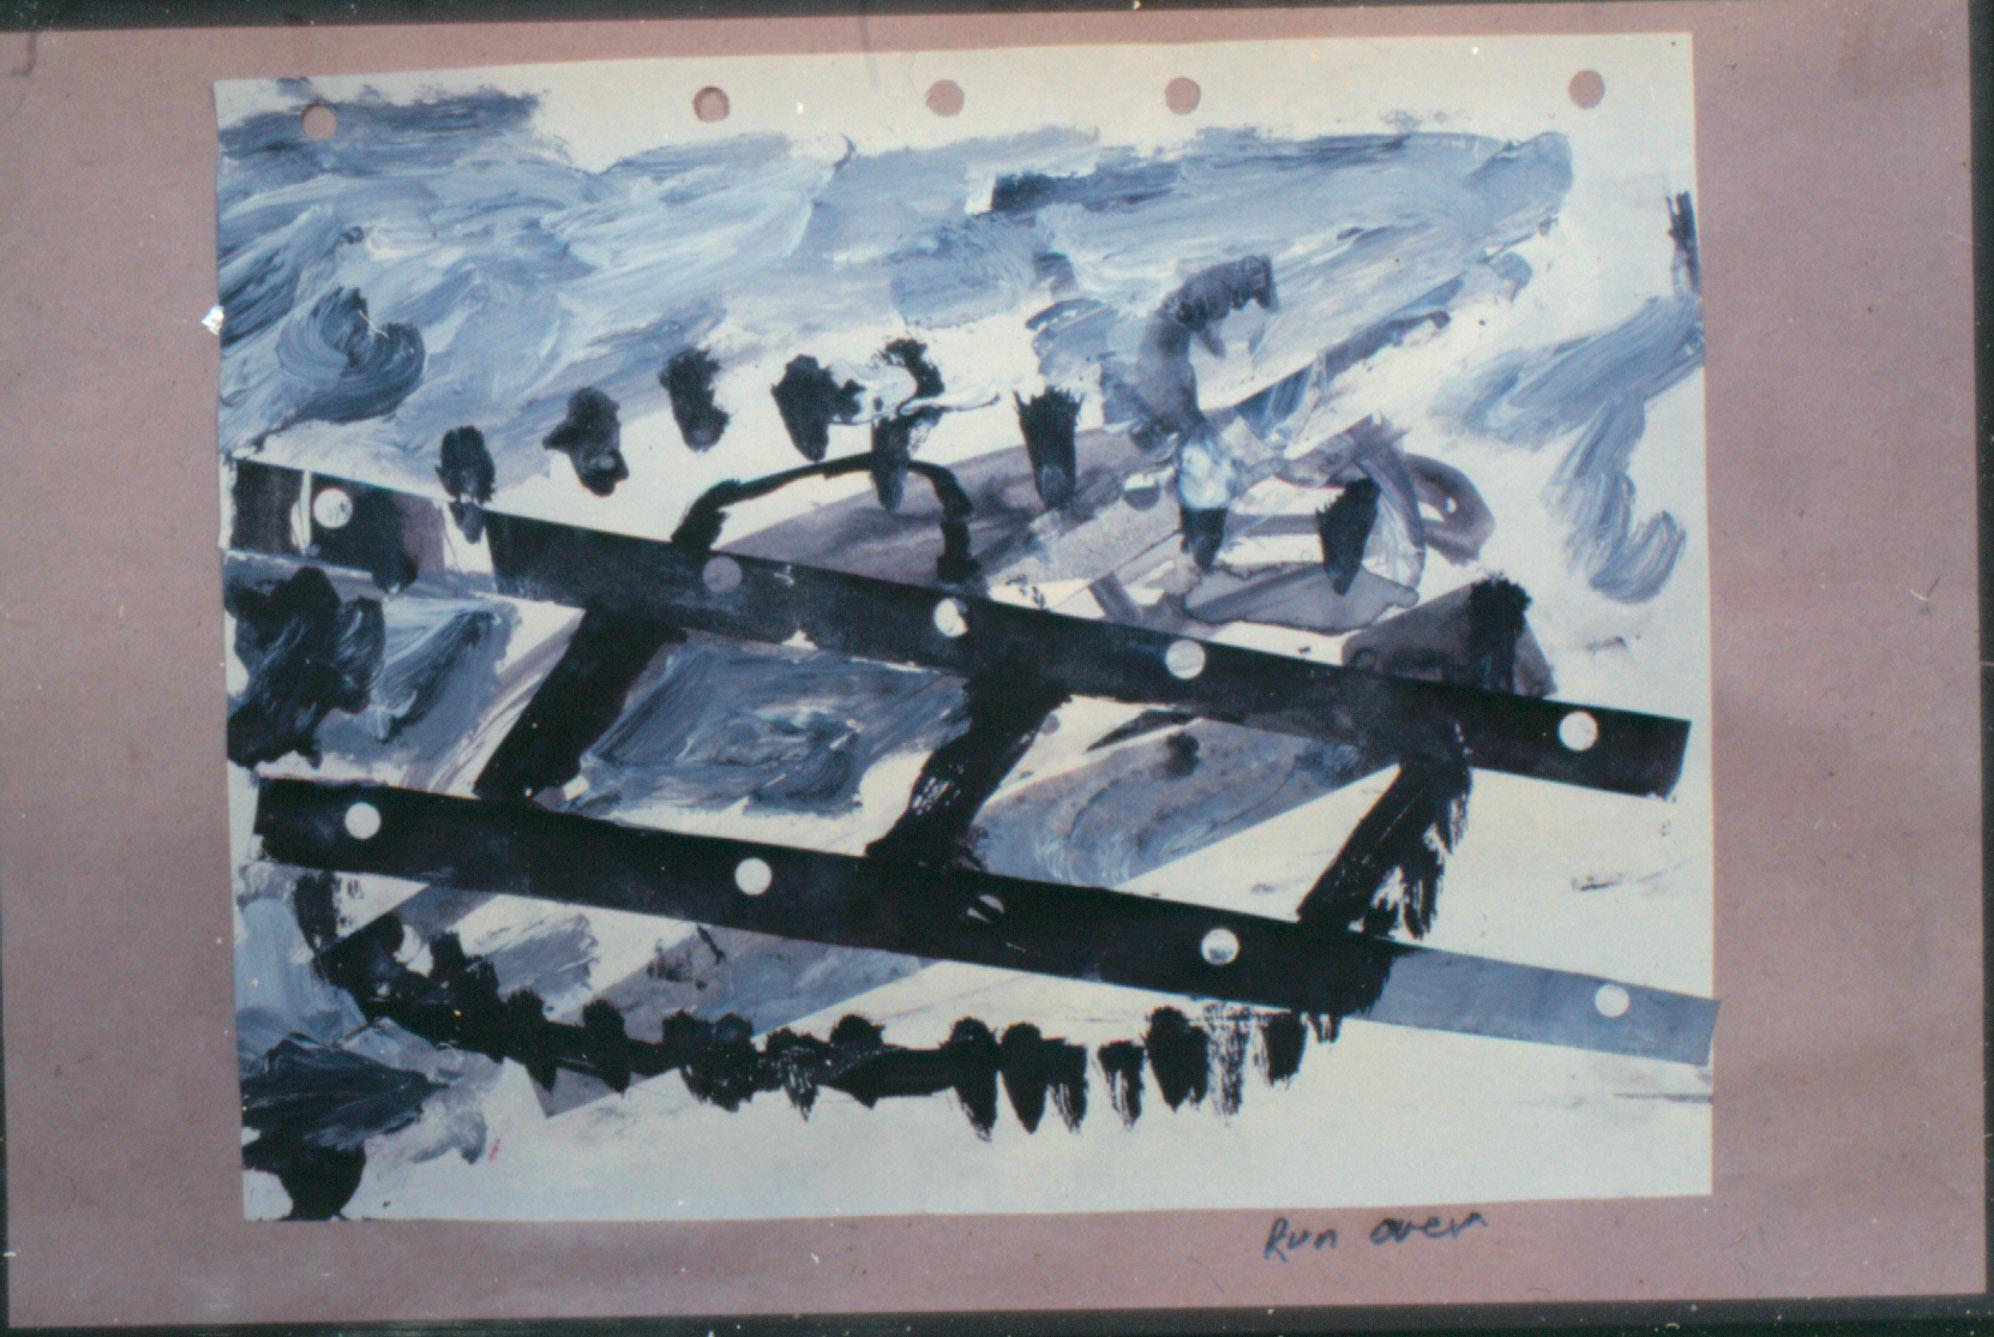 Tina Douglas | untitled | 21 x 30 cm | Acrylic, ink on paper | 1993